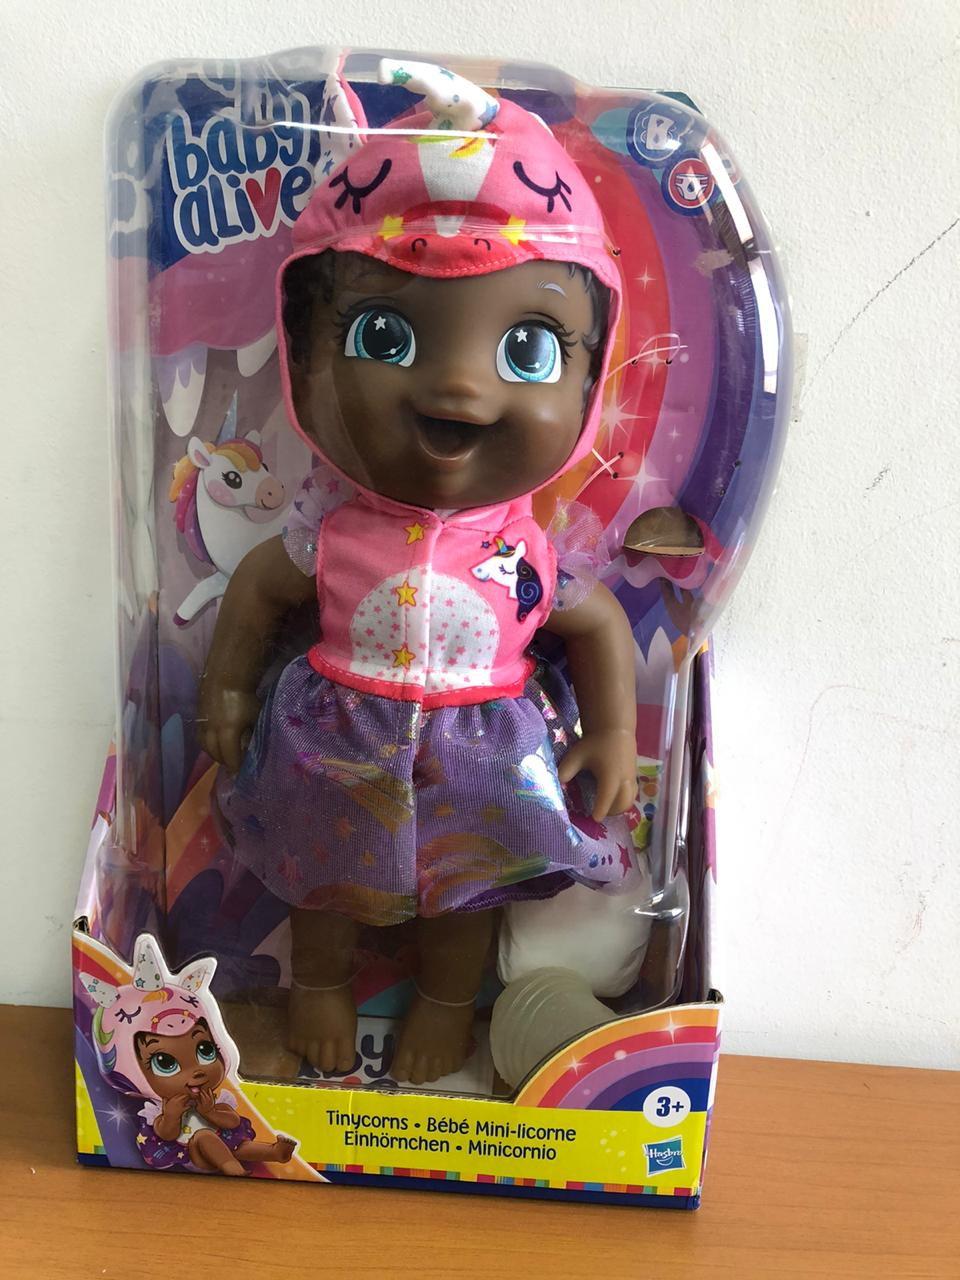 Boneca Baby Alive Tinycorns - Hasbro E9166